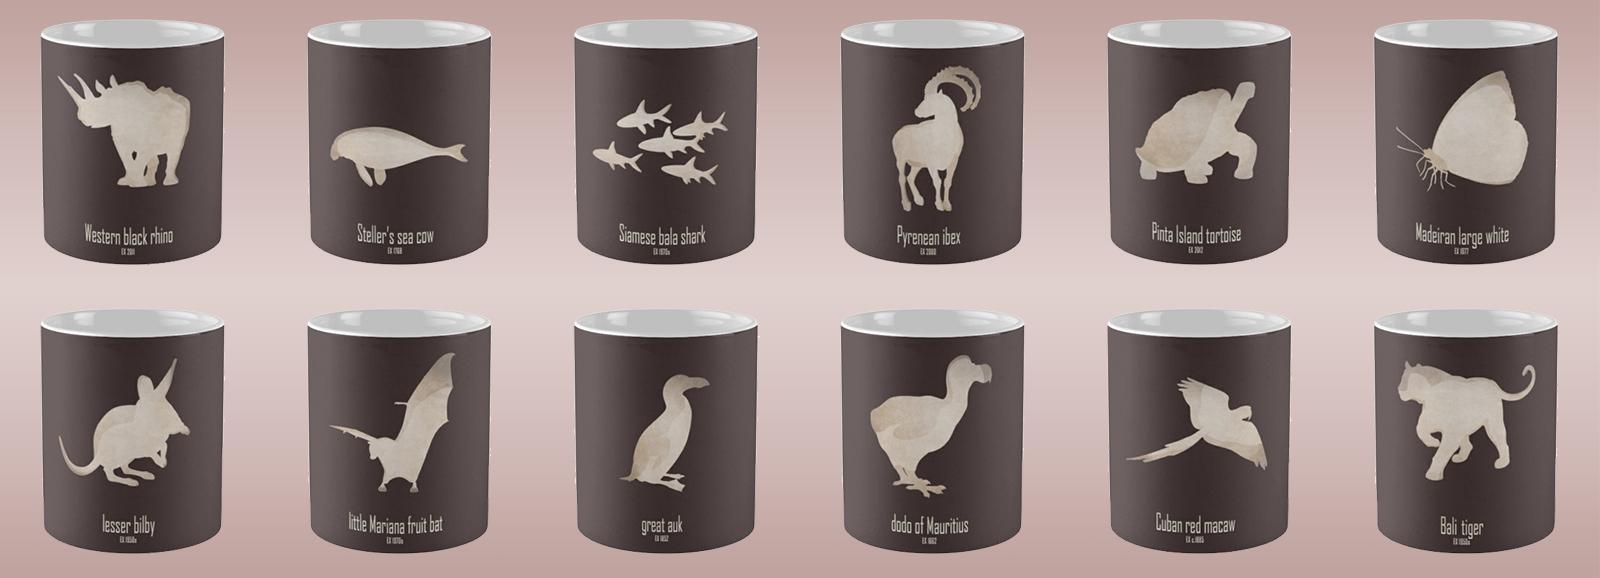 mug coffee tea cup travel extinct animals names list species recently extinct 20th century 21st century IUCN red list wildlife conservation efforts save wildlife planet earth logo biodiversity environmentalist emblematic symbol